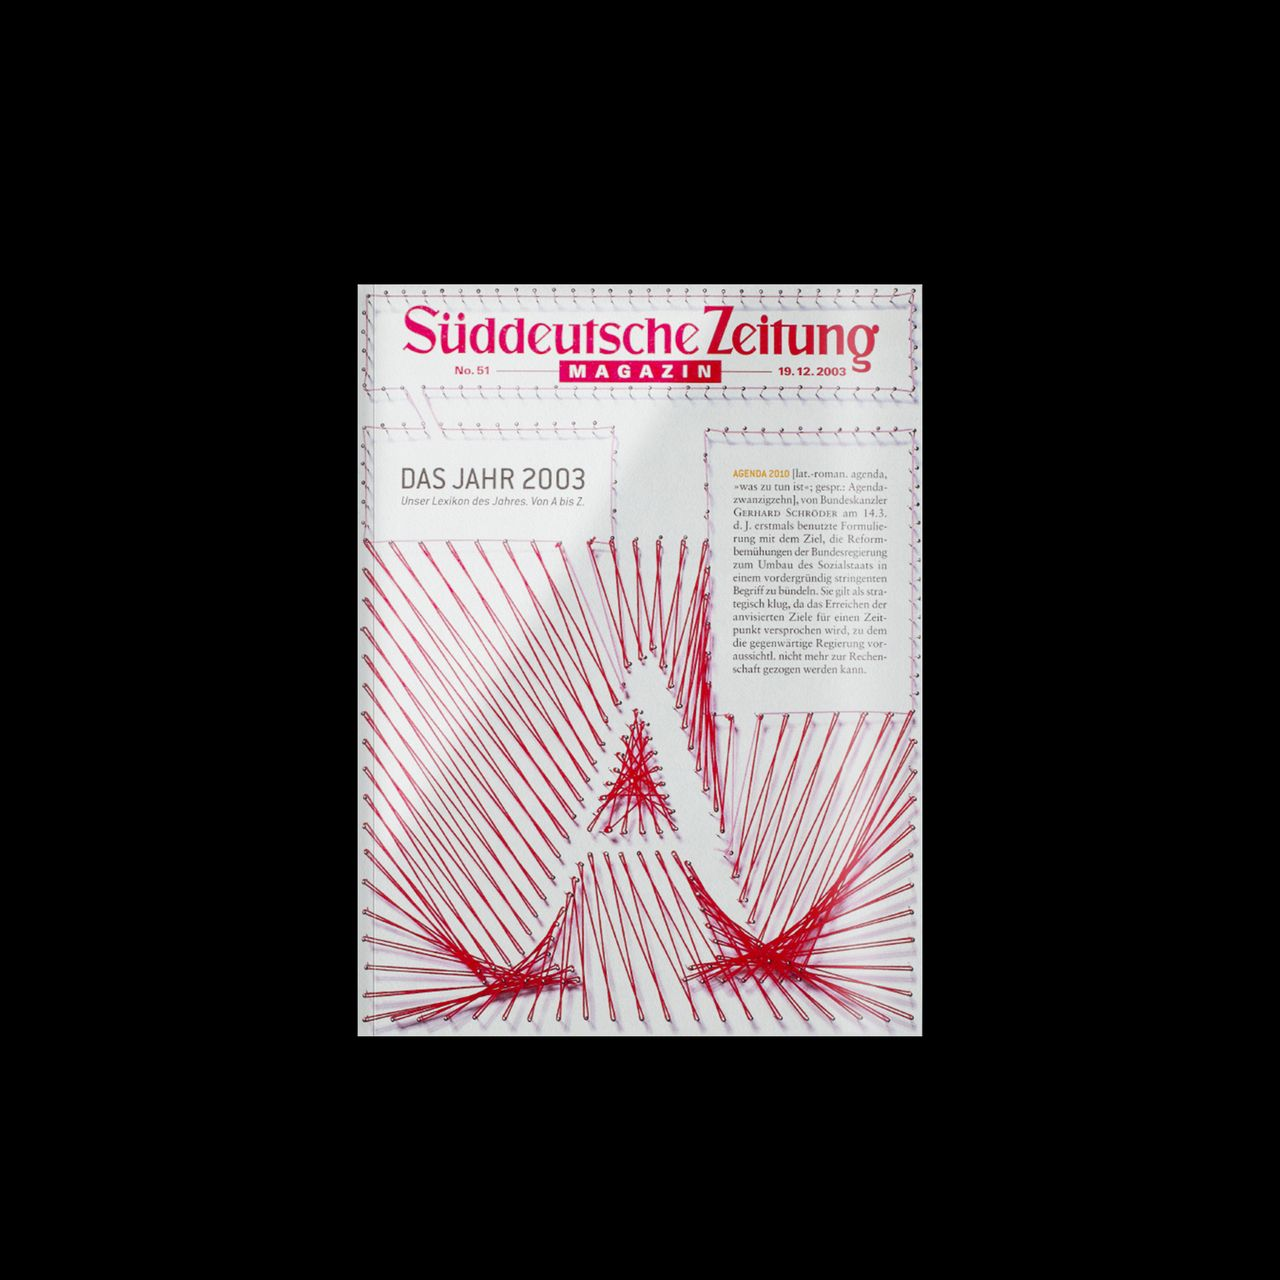 SZ Magazine, Studio Umlaut